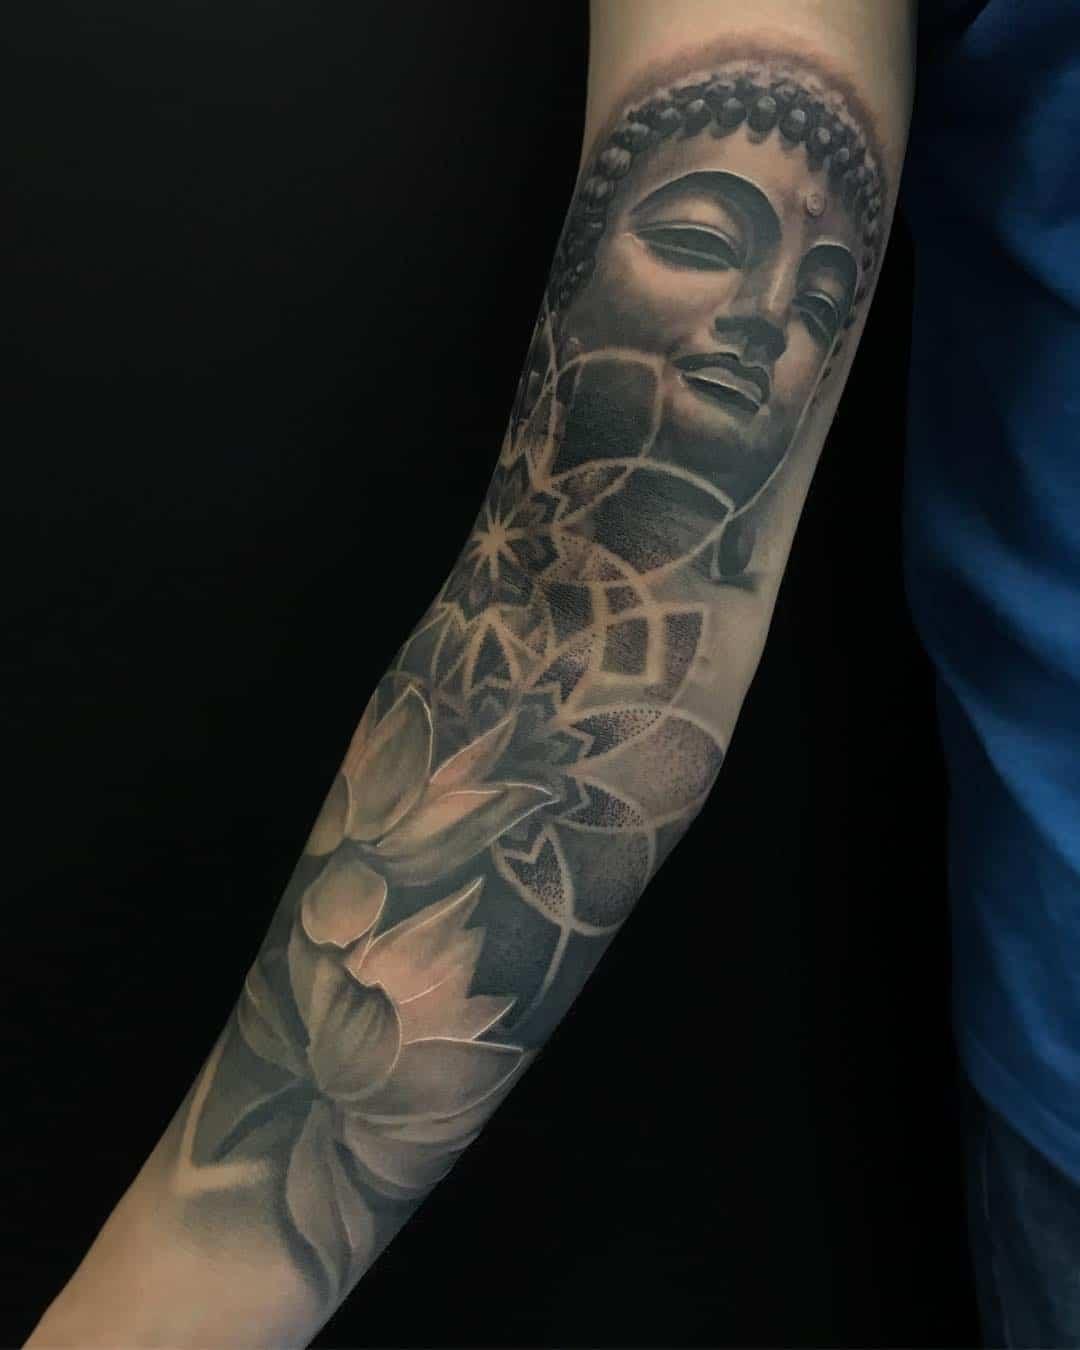 Tattoo by @louisraeltattoos